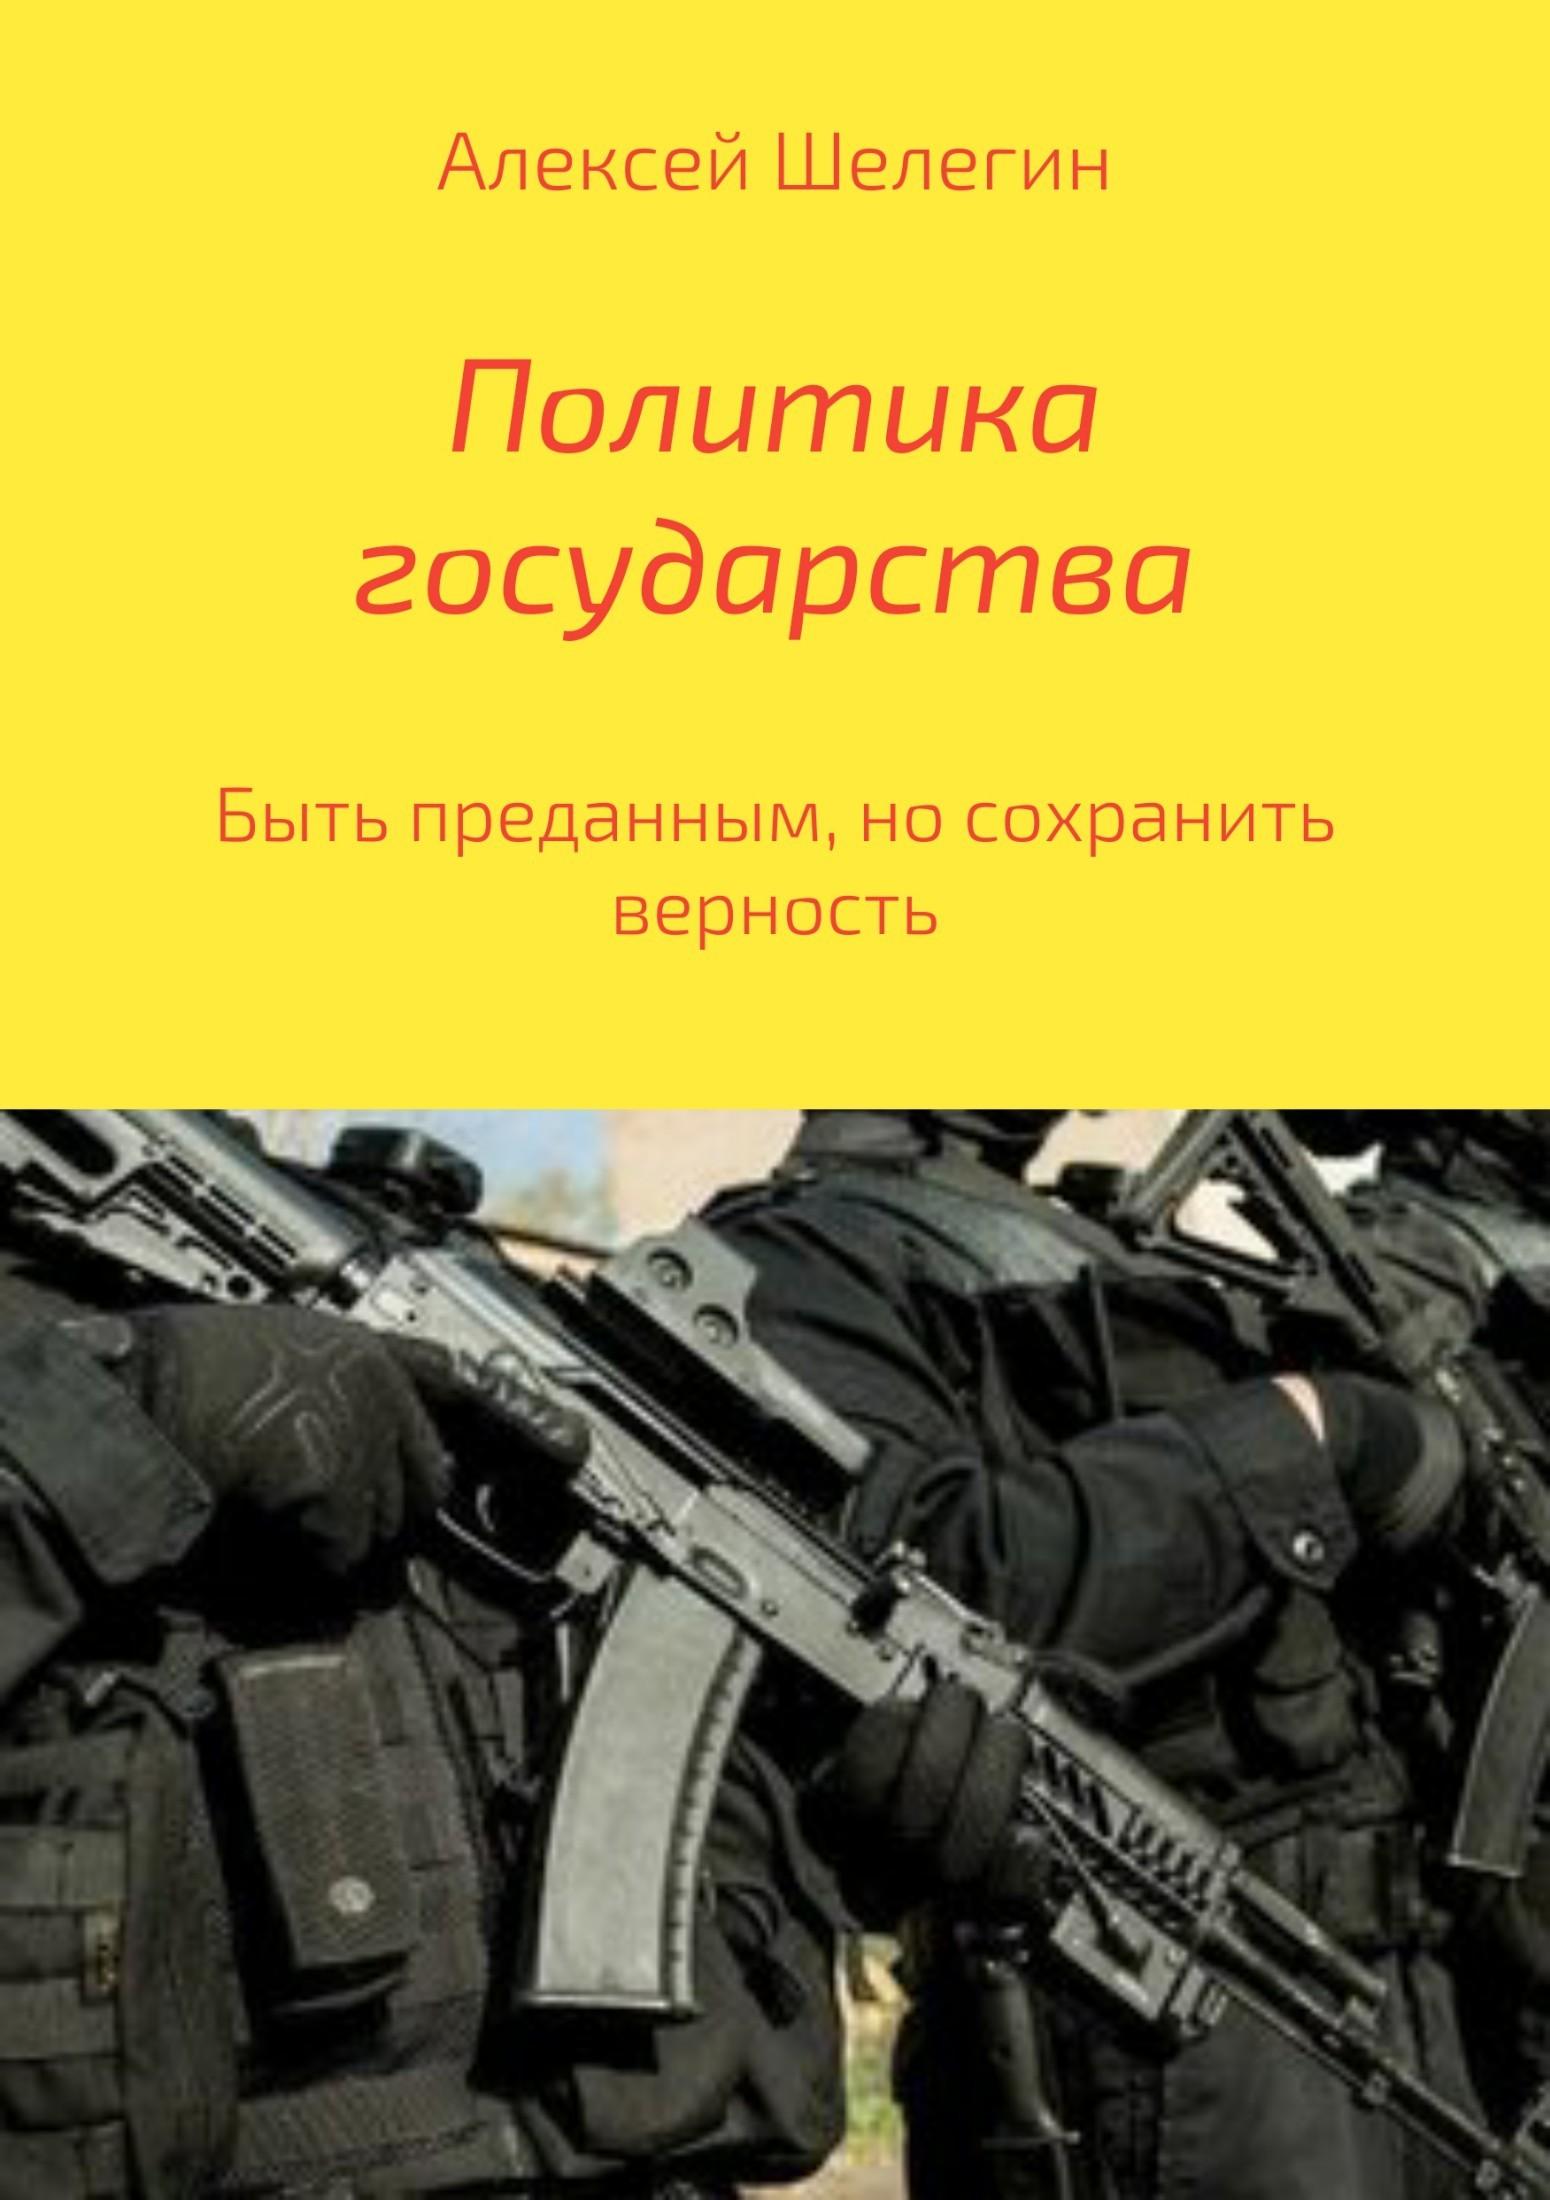 Алексей Владимирович Шелегин. Политика государства